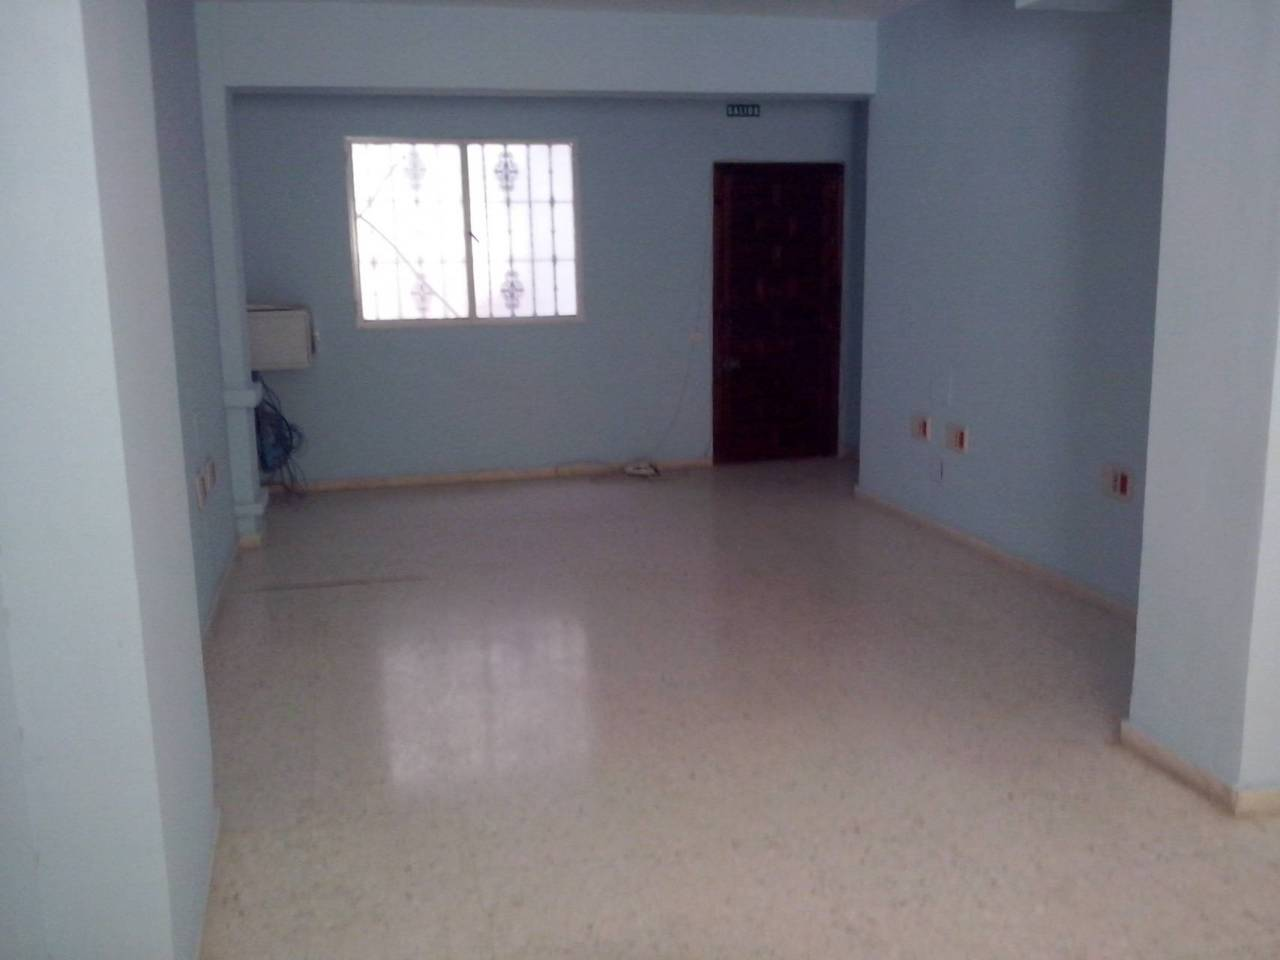 Local en alquiler con 50 m2,  en Alcalá de Guadaíra, CENTRO